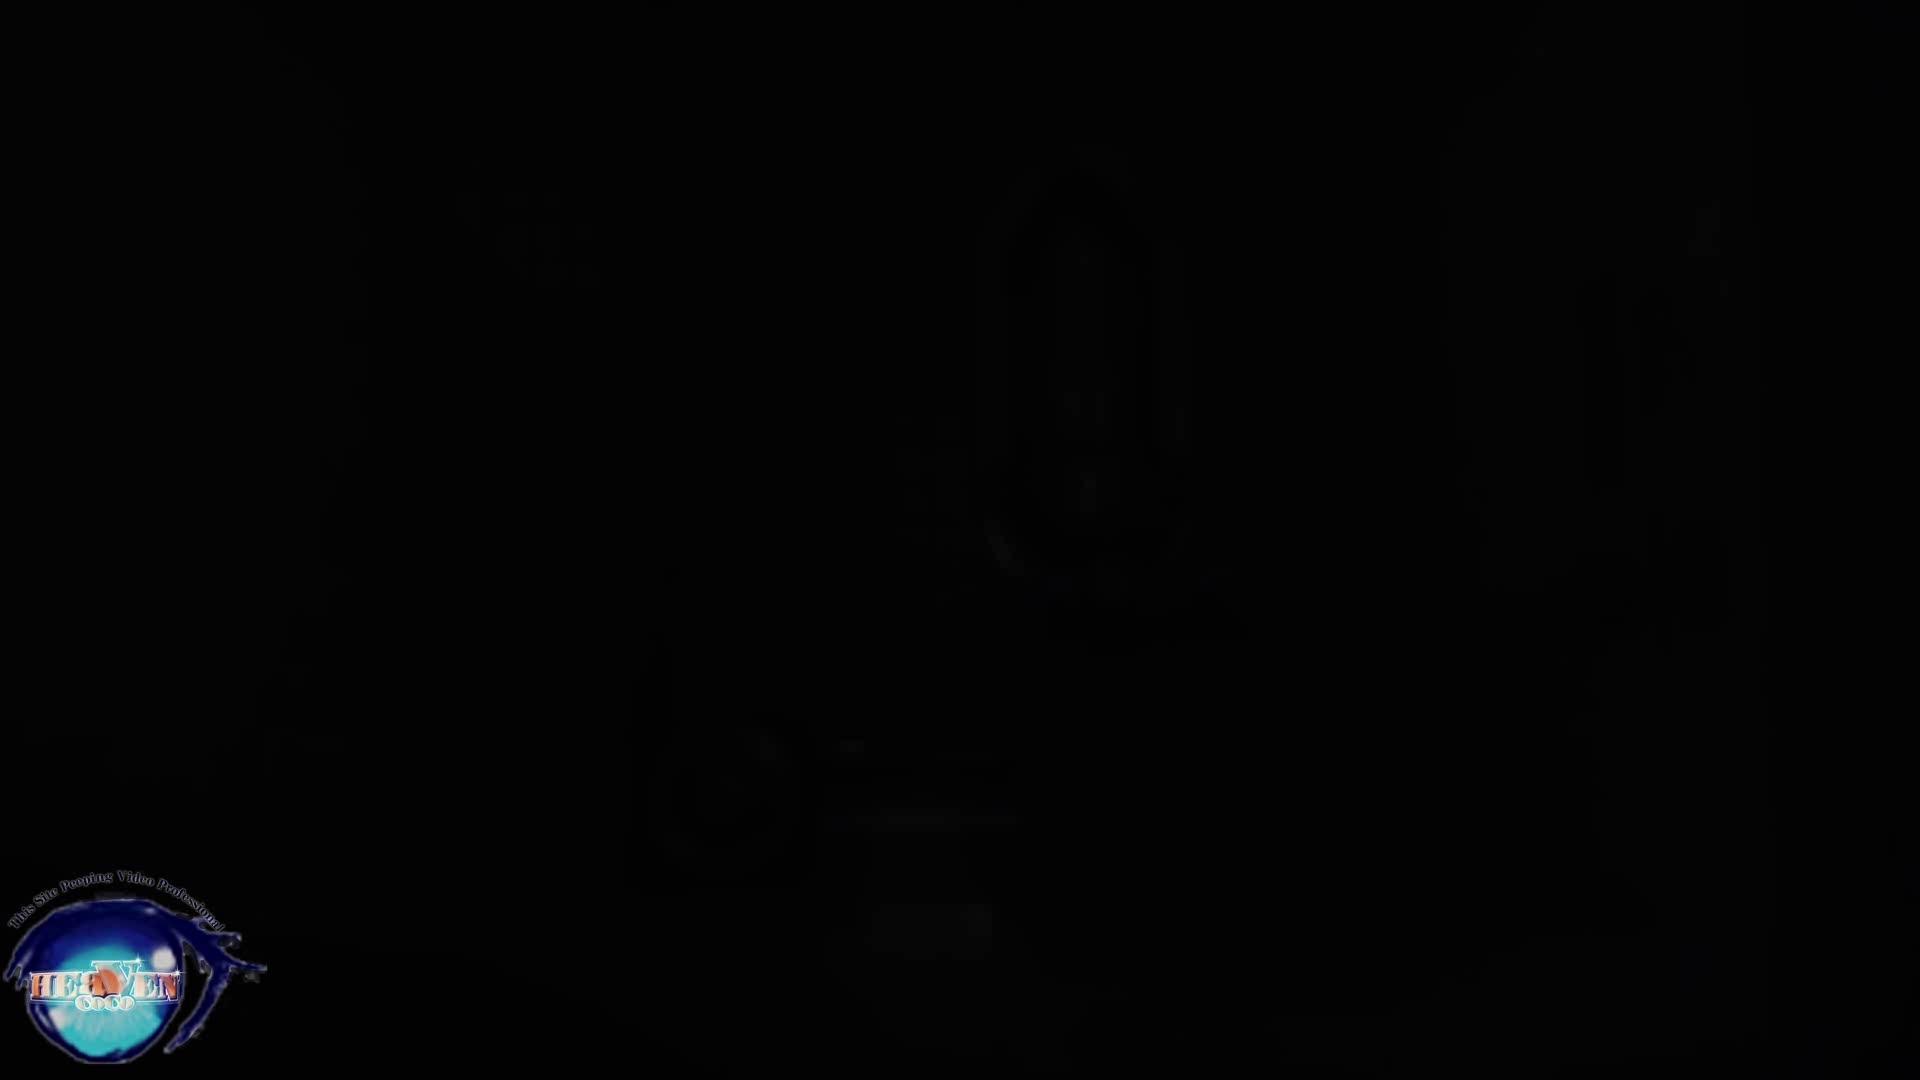 水泳大会選手の聖水 vol.01 トイレ流出 濡れ場動画紹介 64連発 8